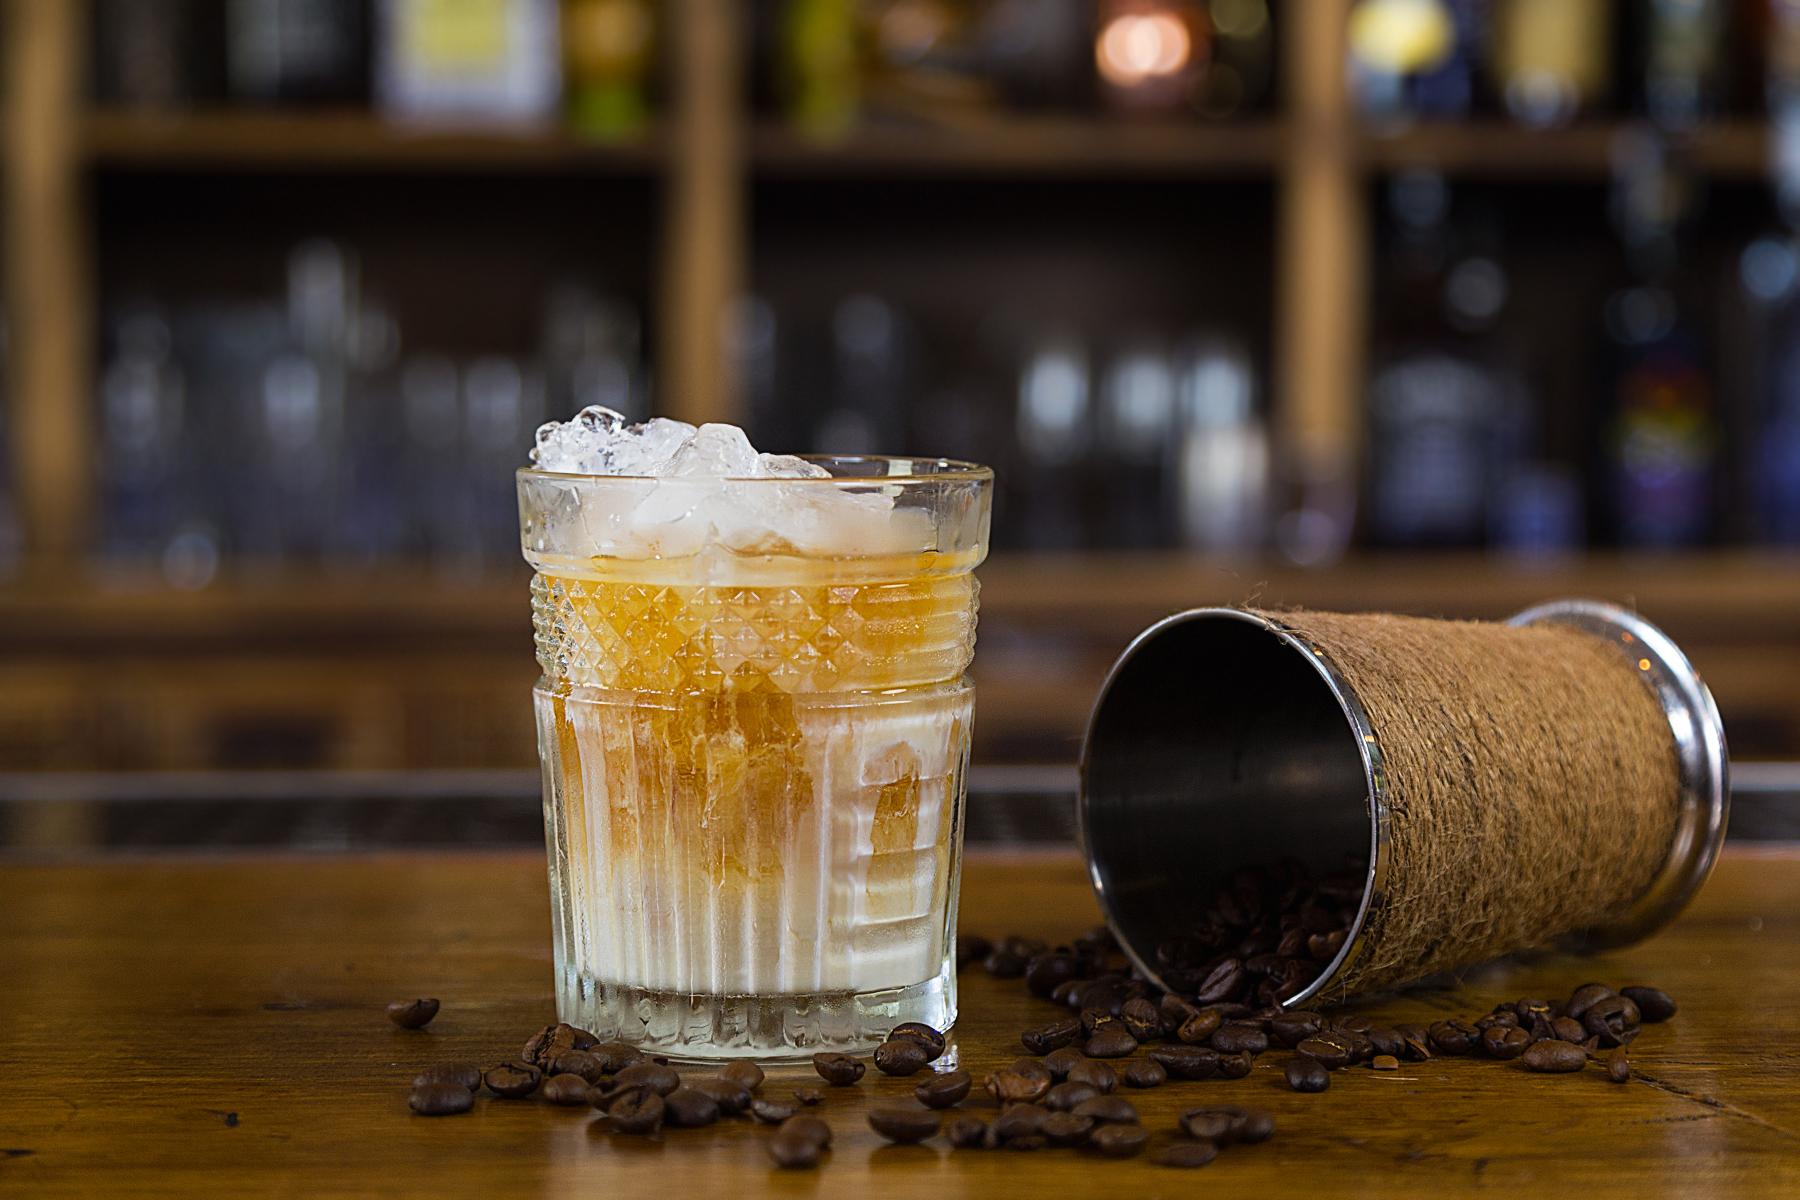 cocktail-drink-Tia-Maria-coctel-mixology-cocktail-Sr-Erreka-Films-Photo-fotografia-producto-publicidad-cine-publicitario-spots-clips.jpg